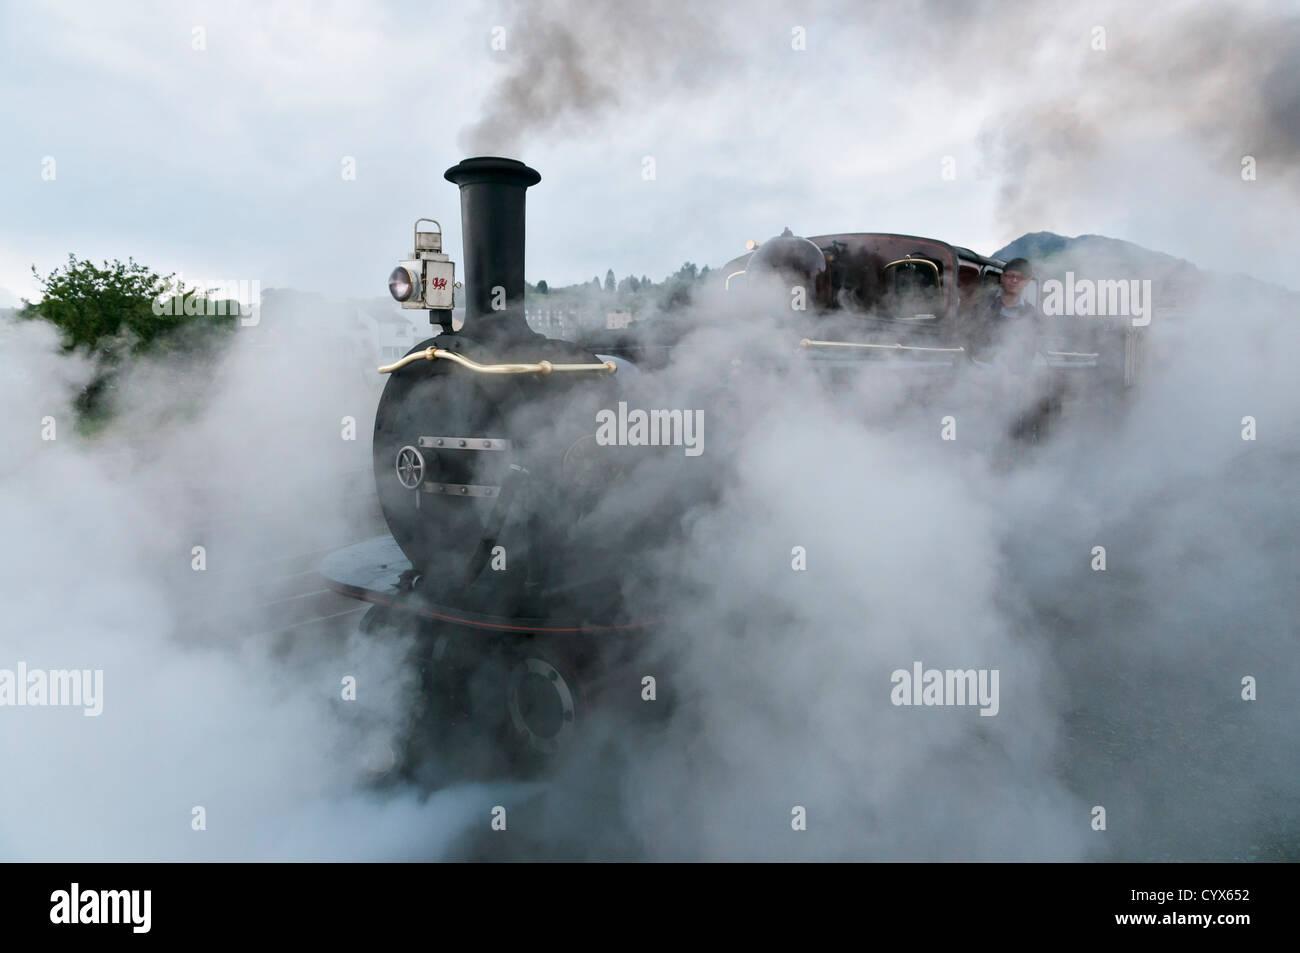 Wales, Ffestiniog Railway, steam locomotive at Porthmadog station - Stock Image